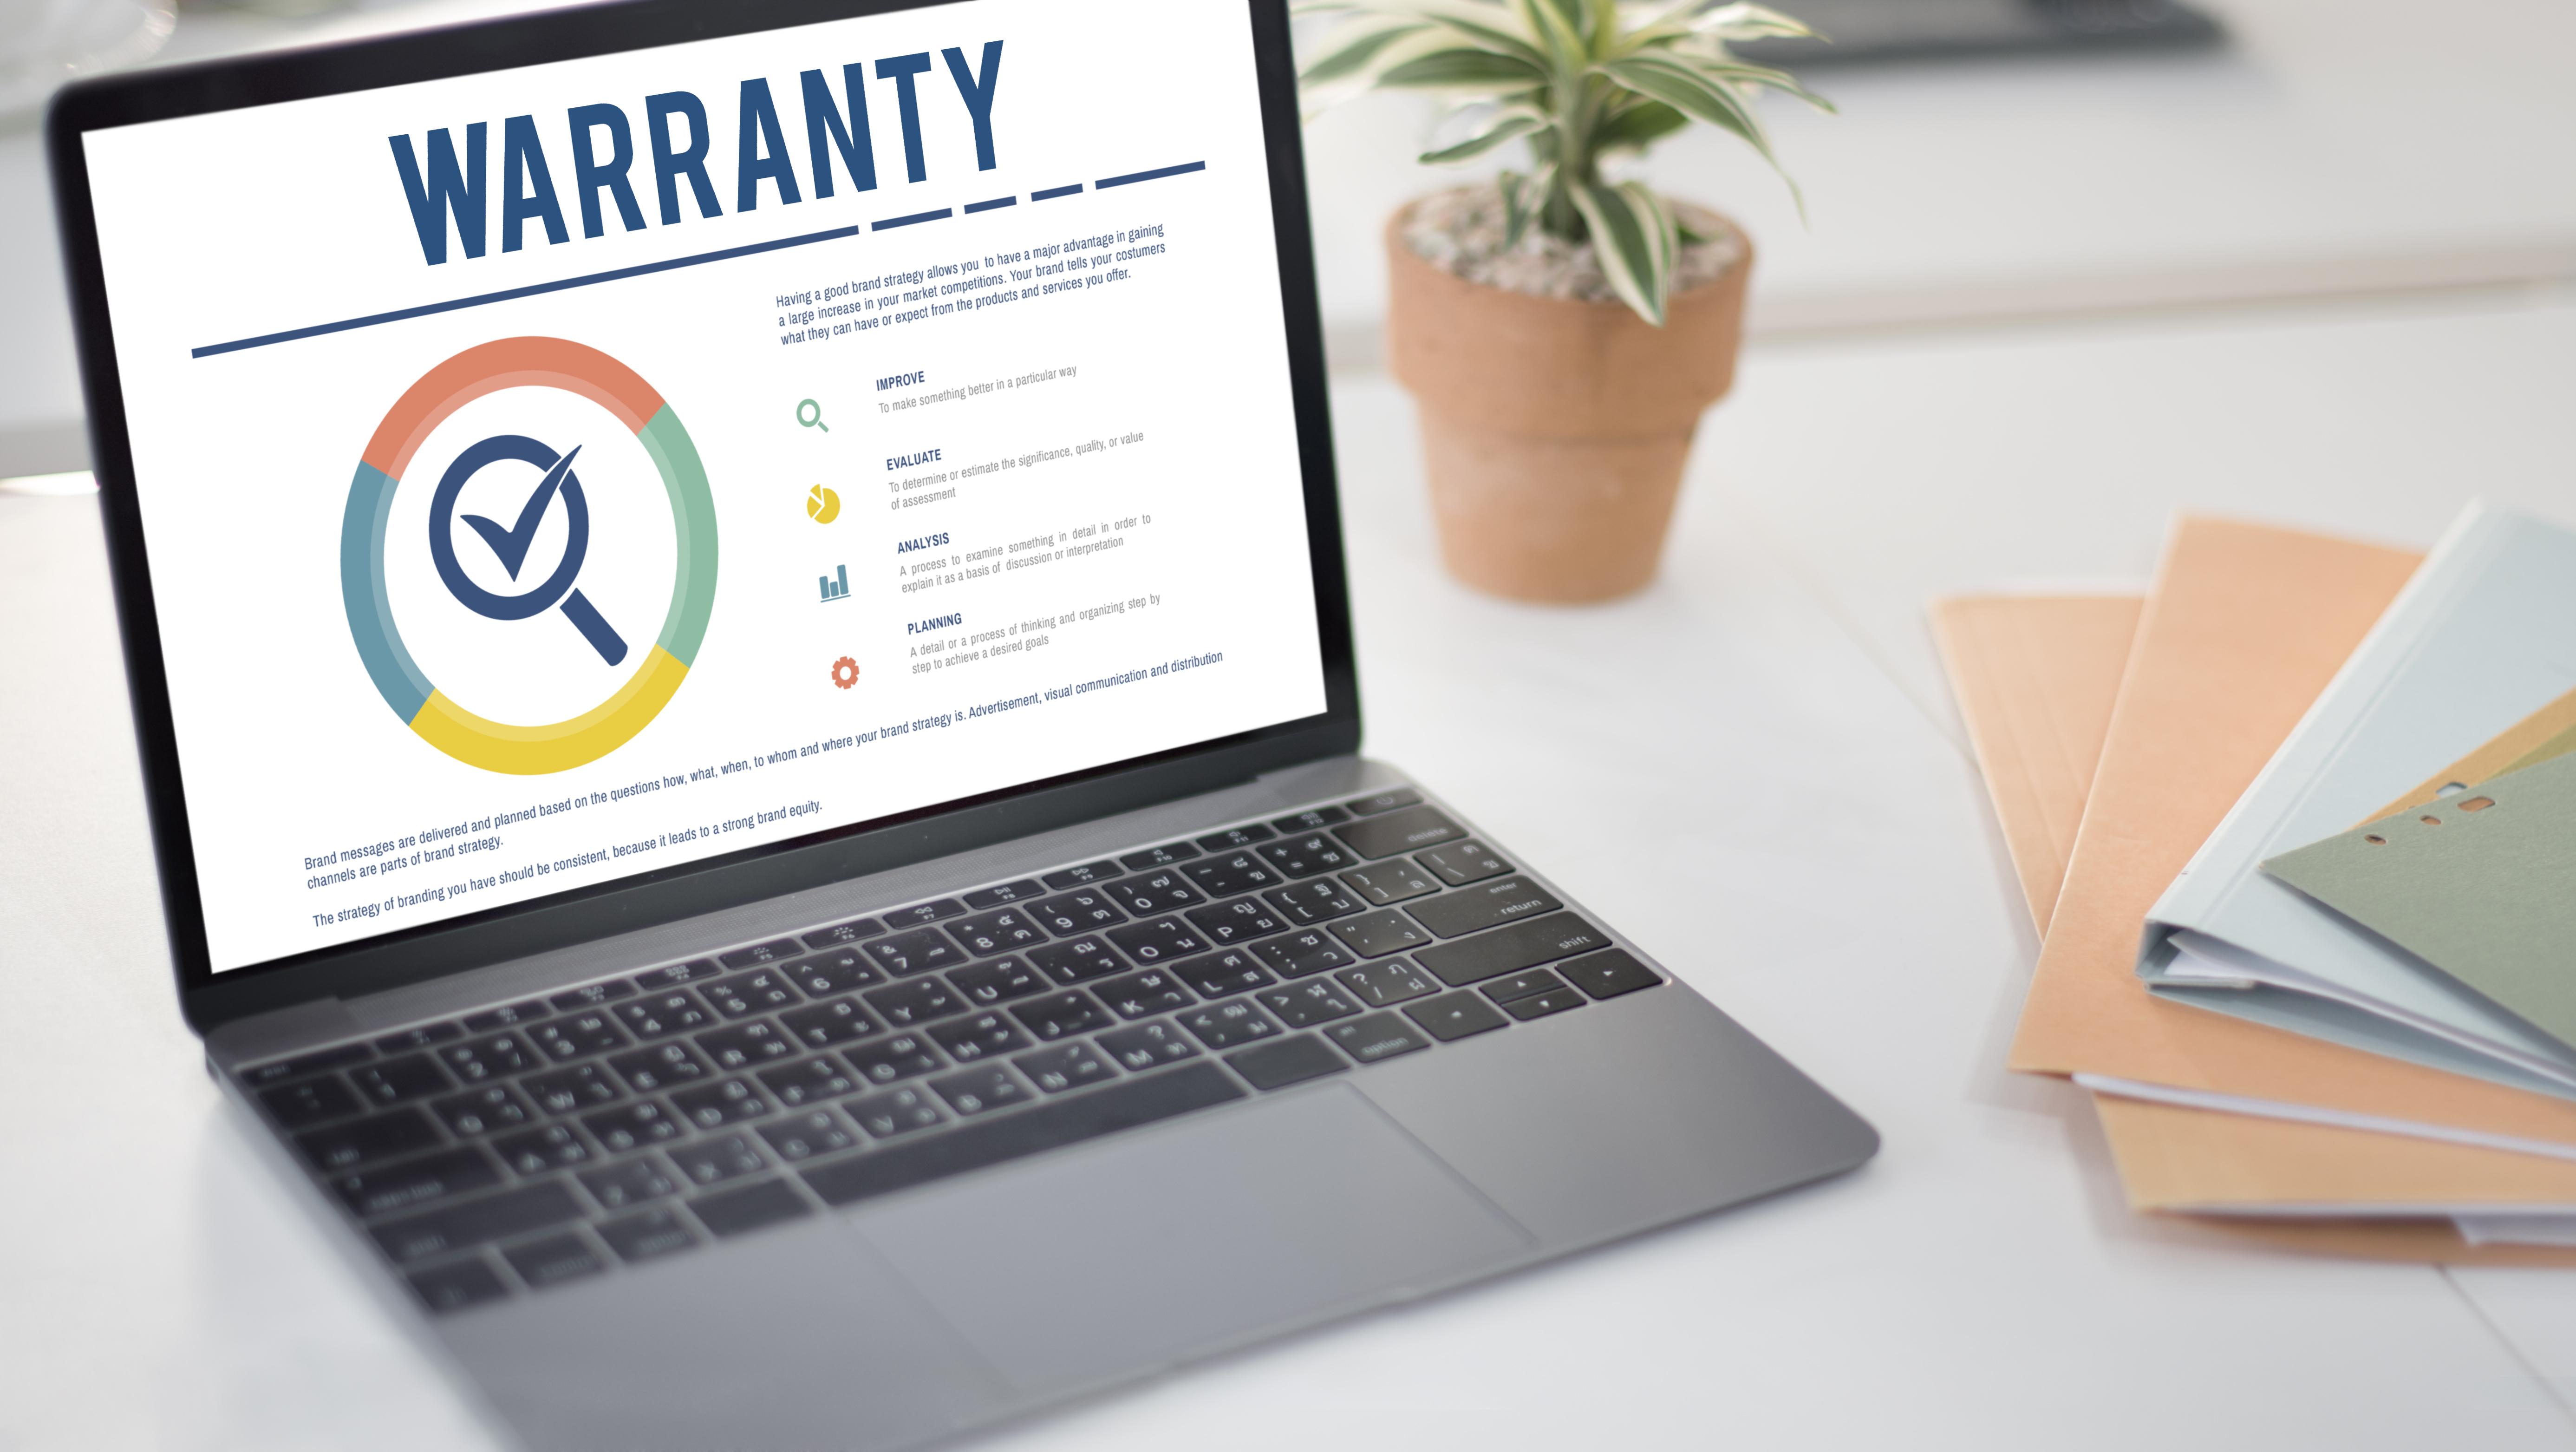 Warranty management software